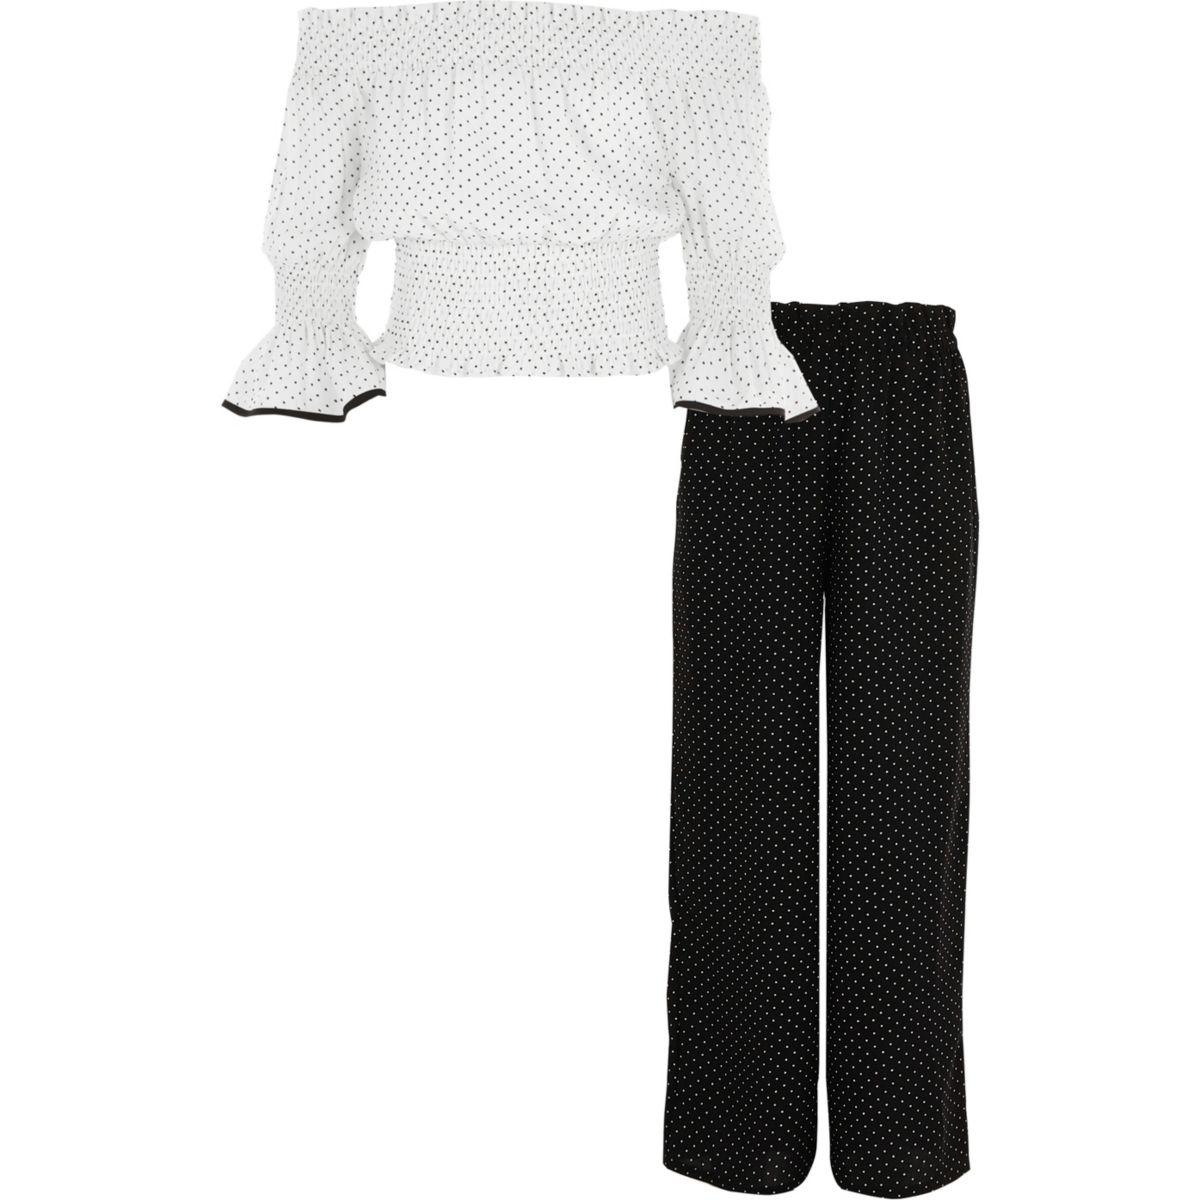 Girls cream polka dot bardot top outfit